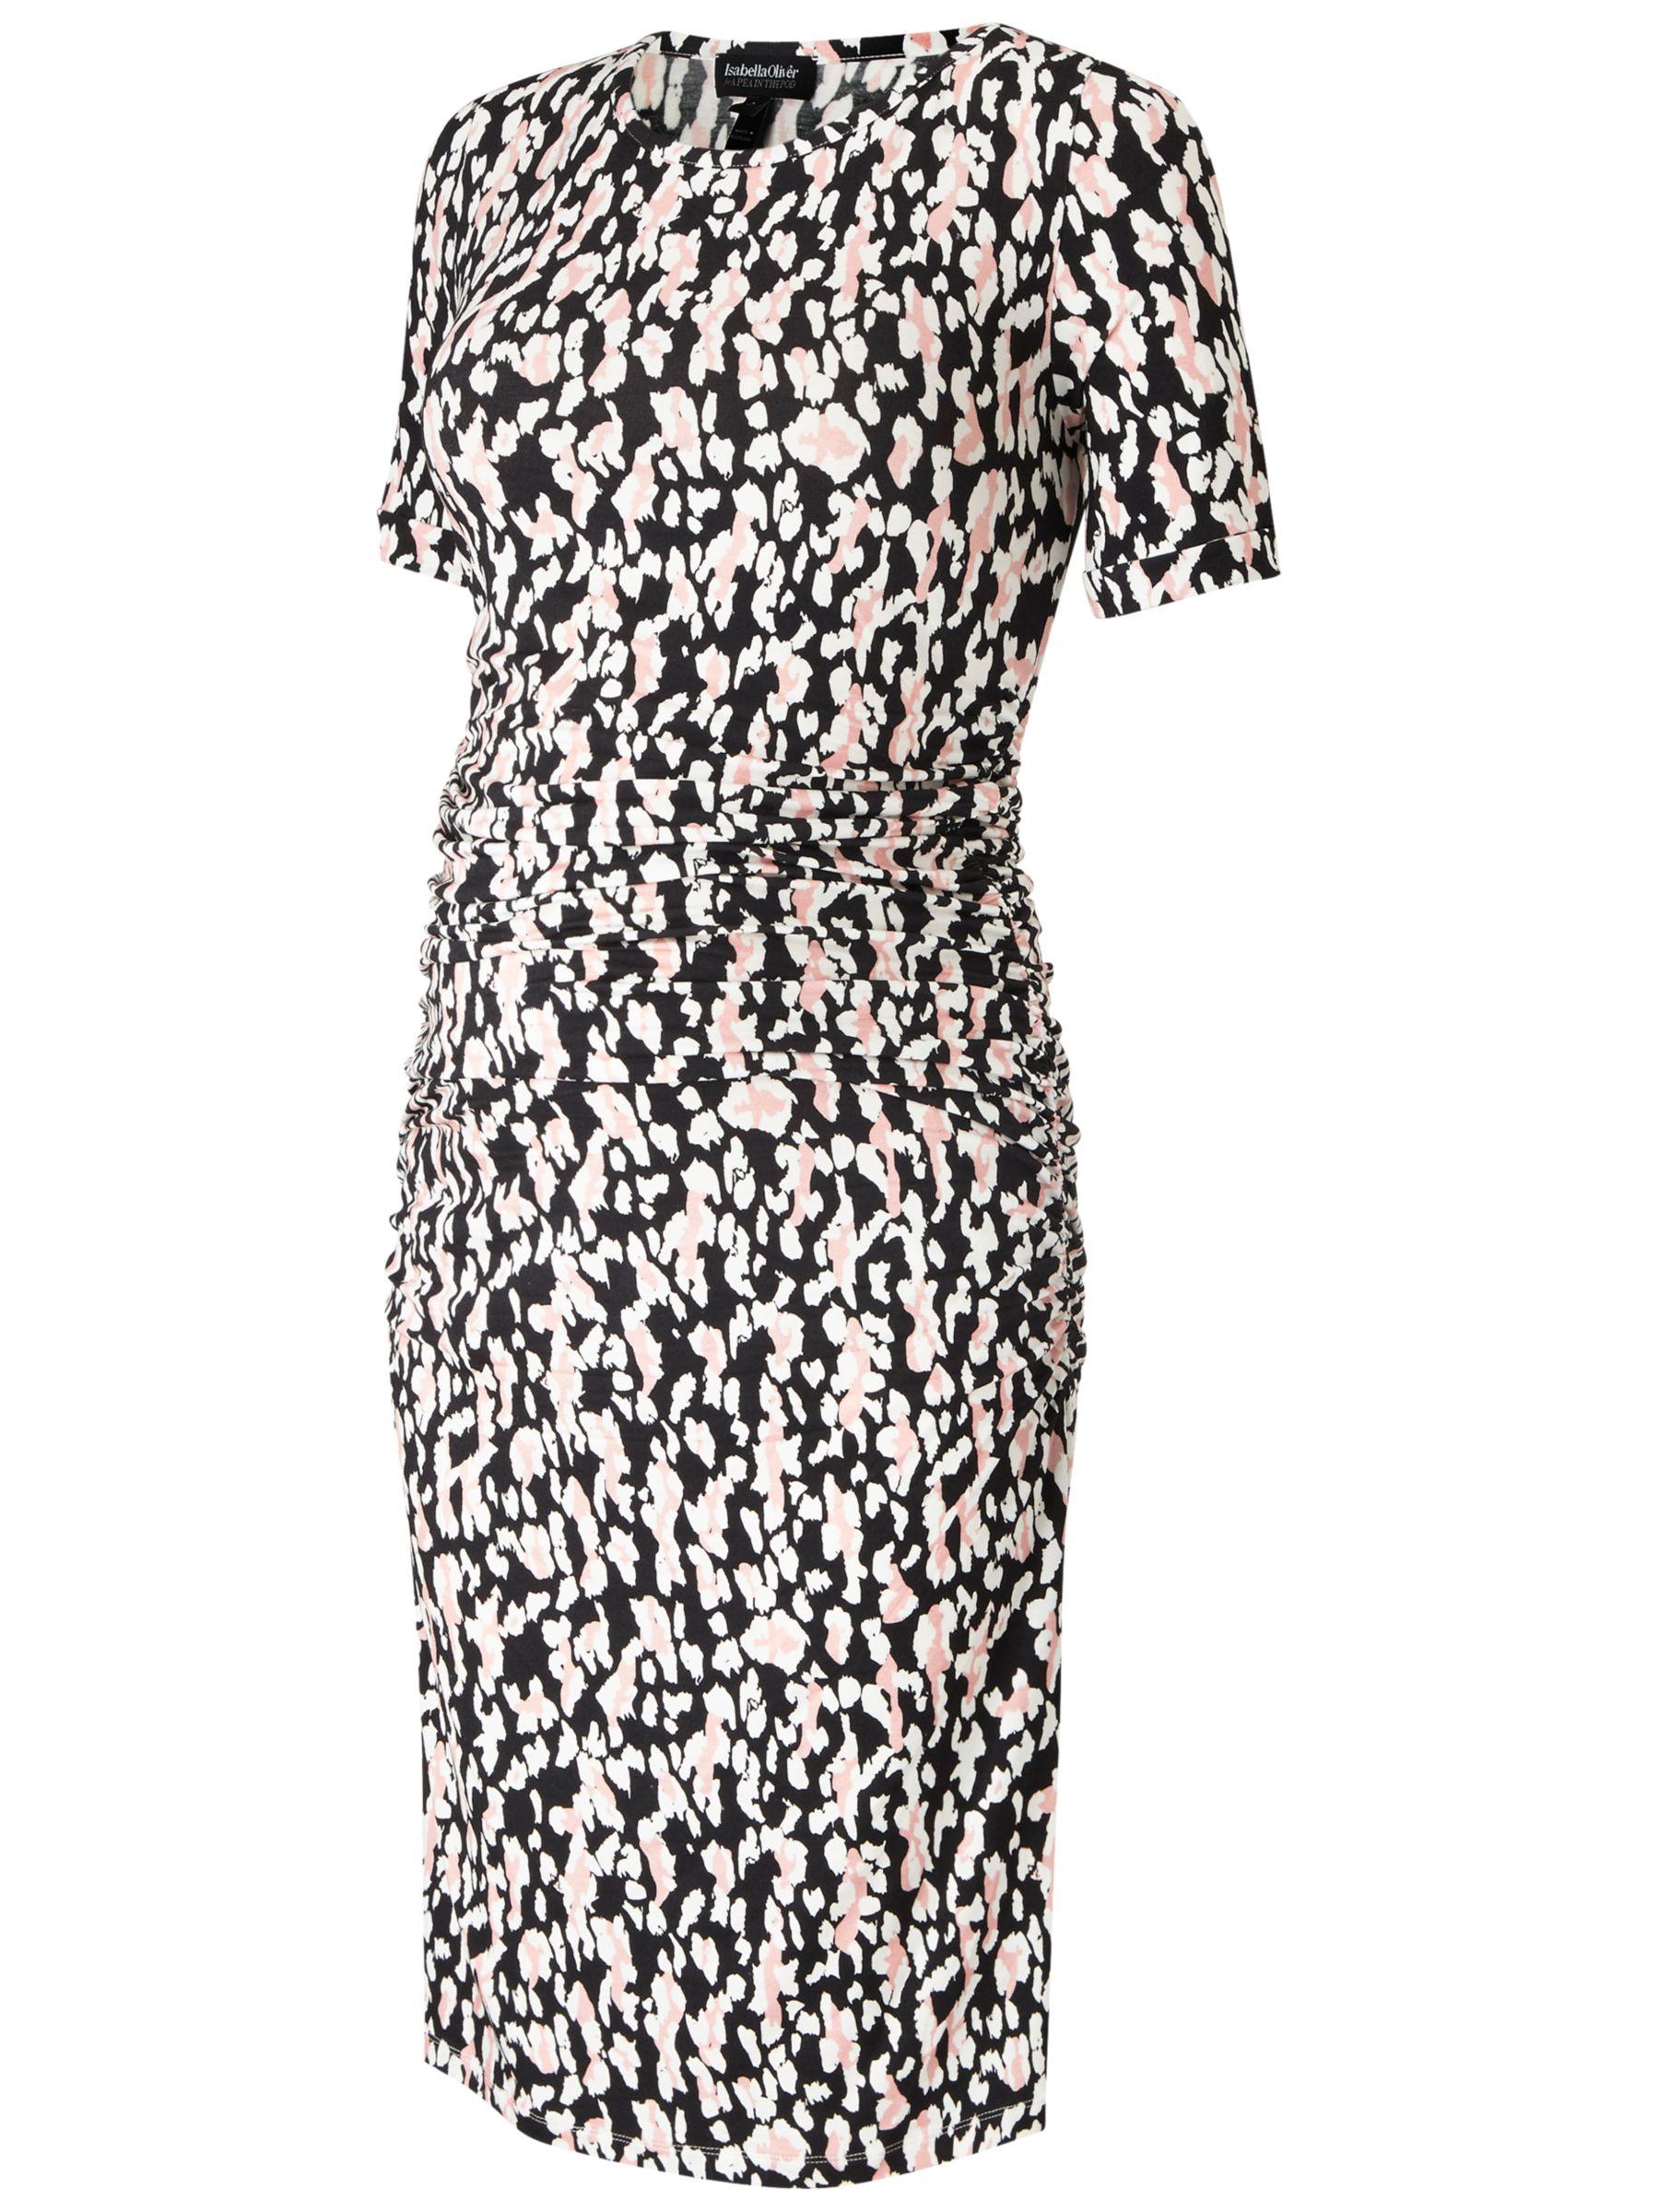 Isabella Oliver Isabella Oliver Ida Ruched Maternity Dress, Black/White